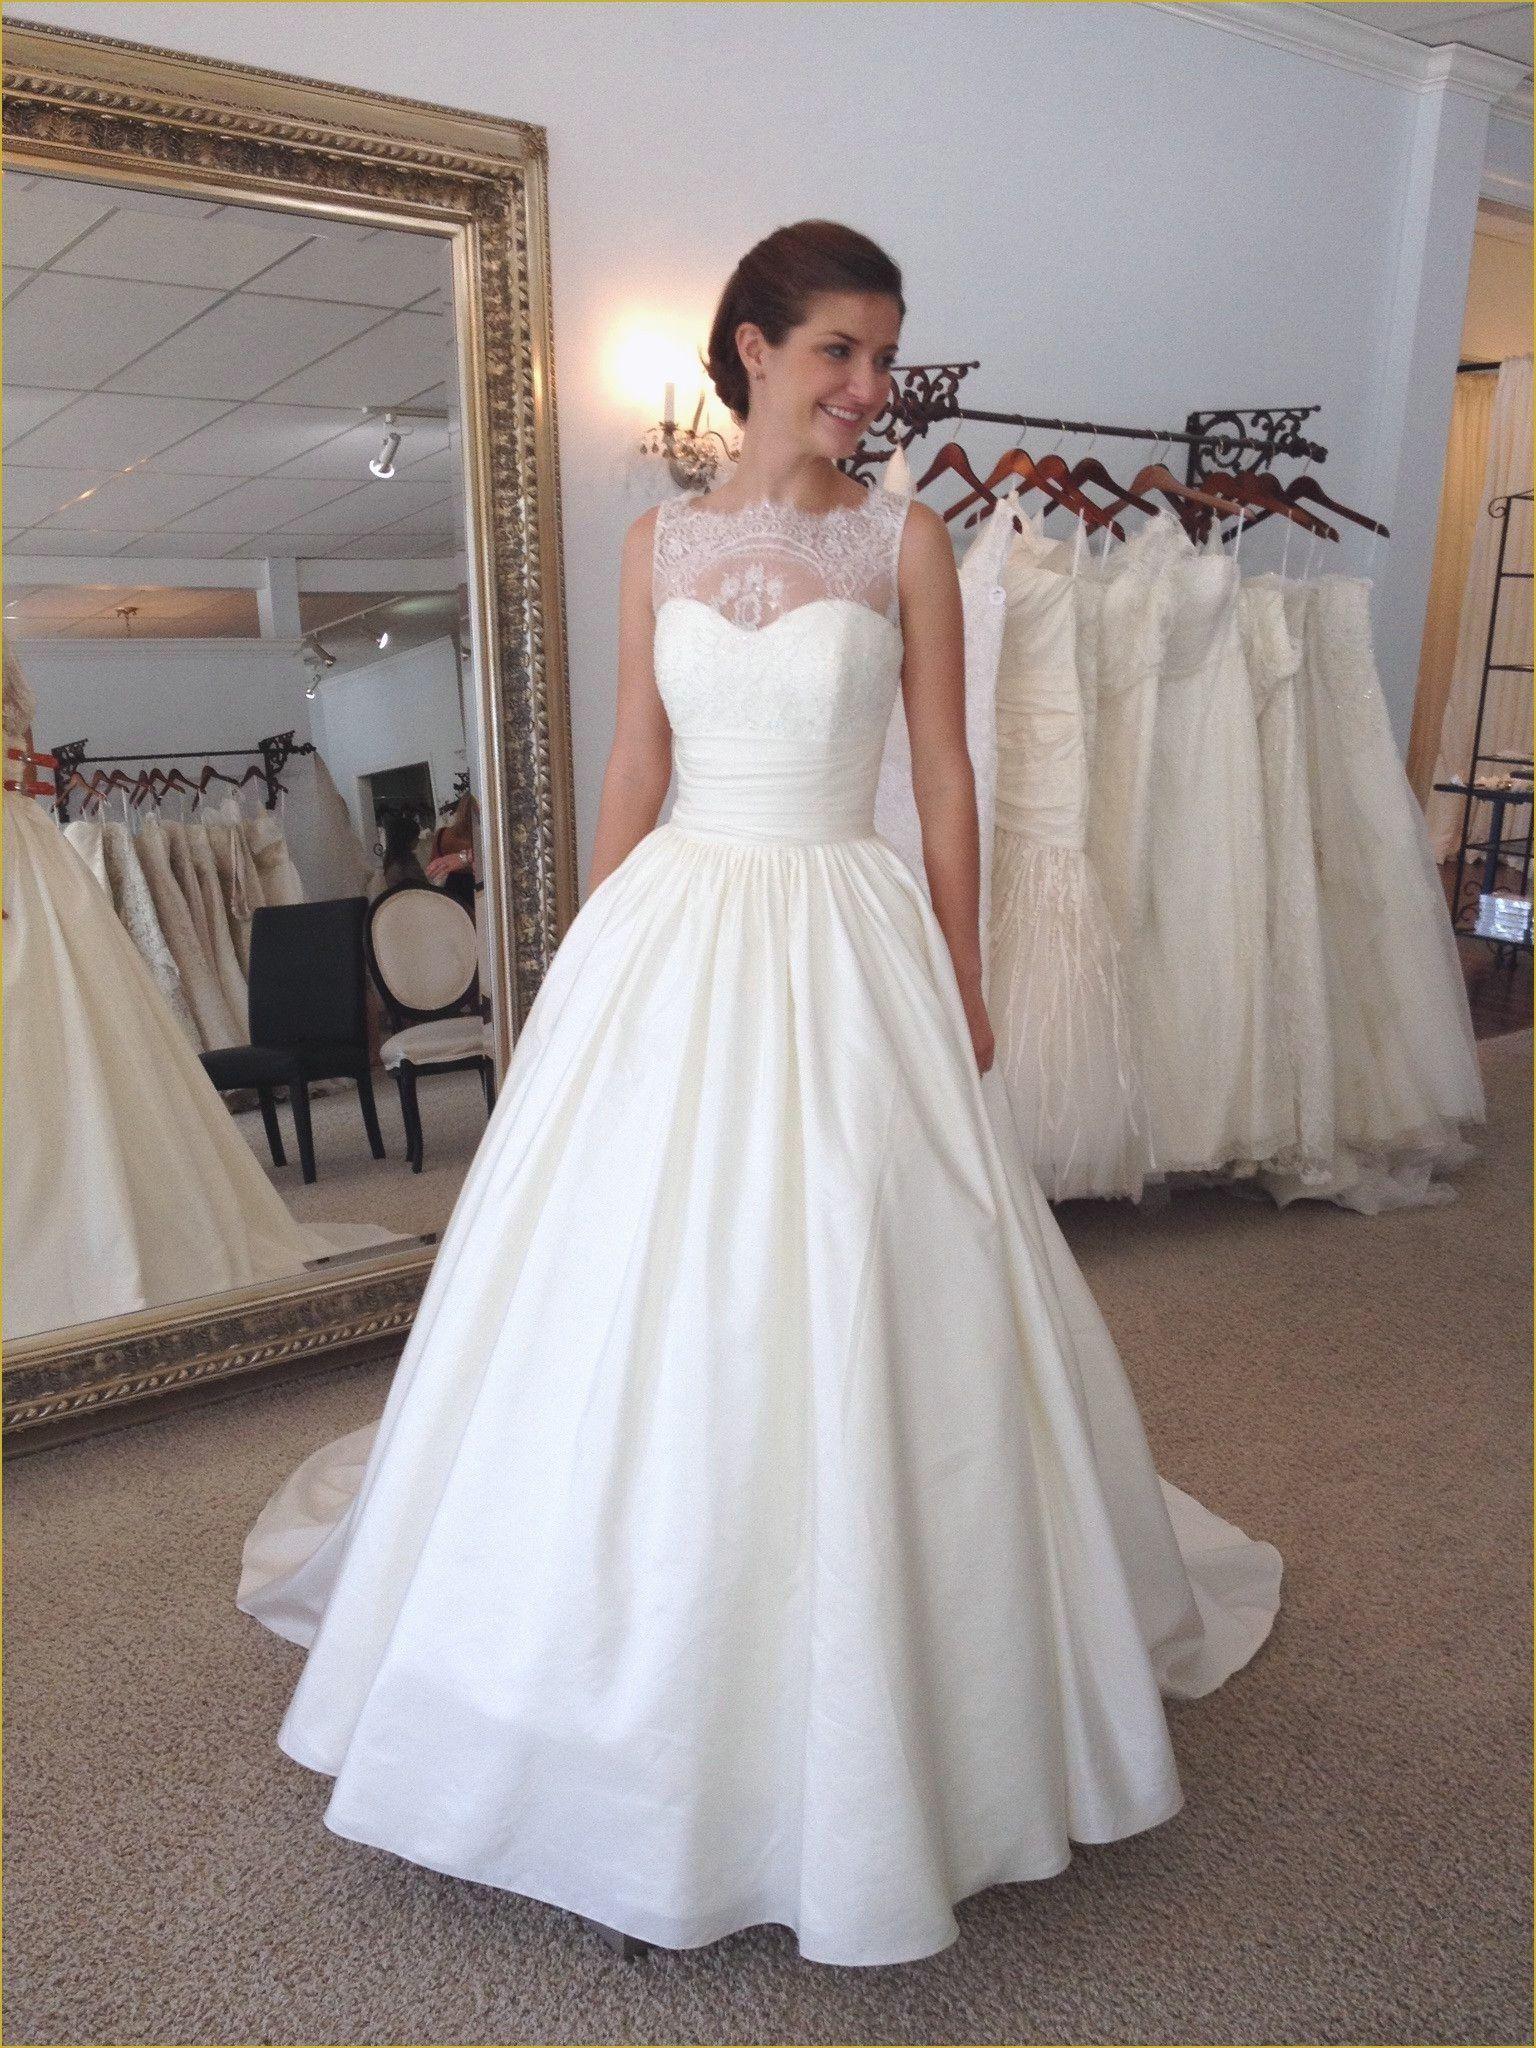 Crazy wedding dresses fresh 20 wedding dresses